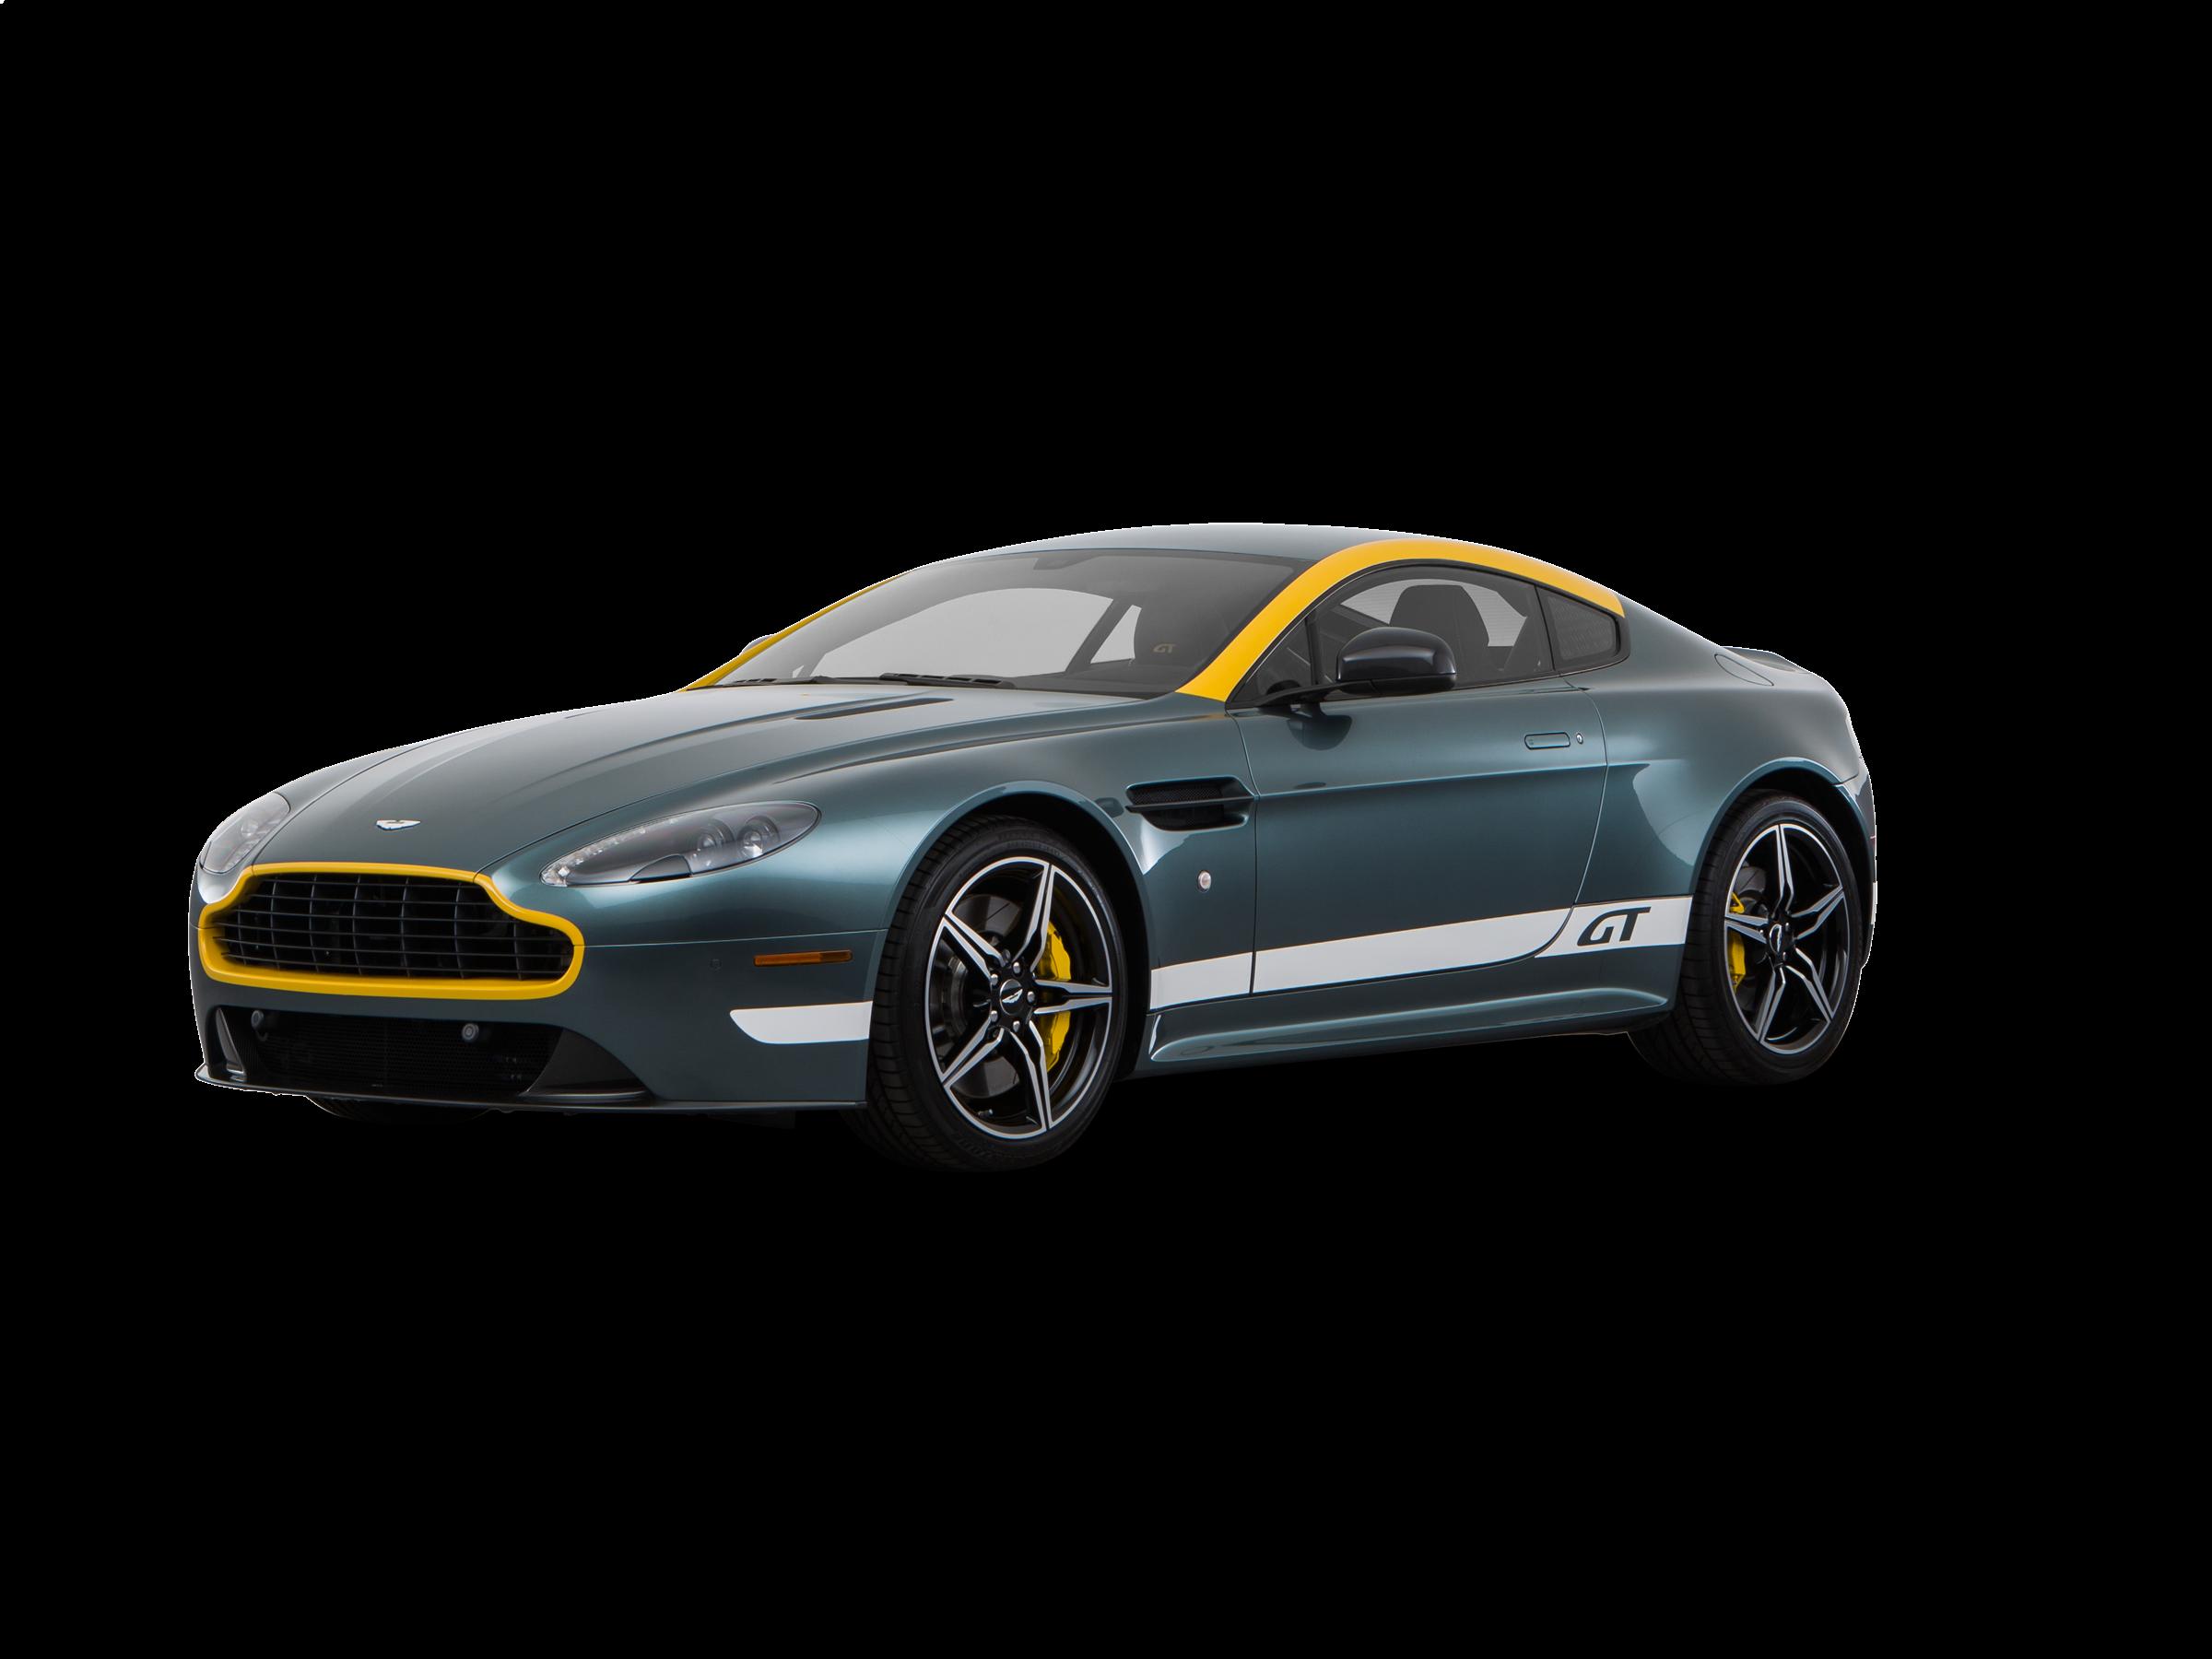 2016 Aston Martin Vantage Values Cars For Sale Kelley Blue Book